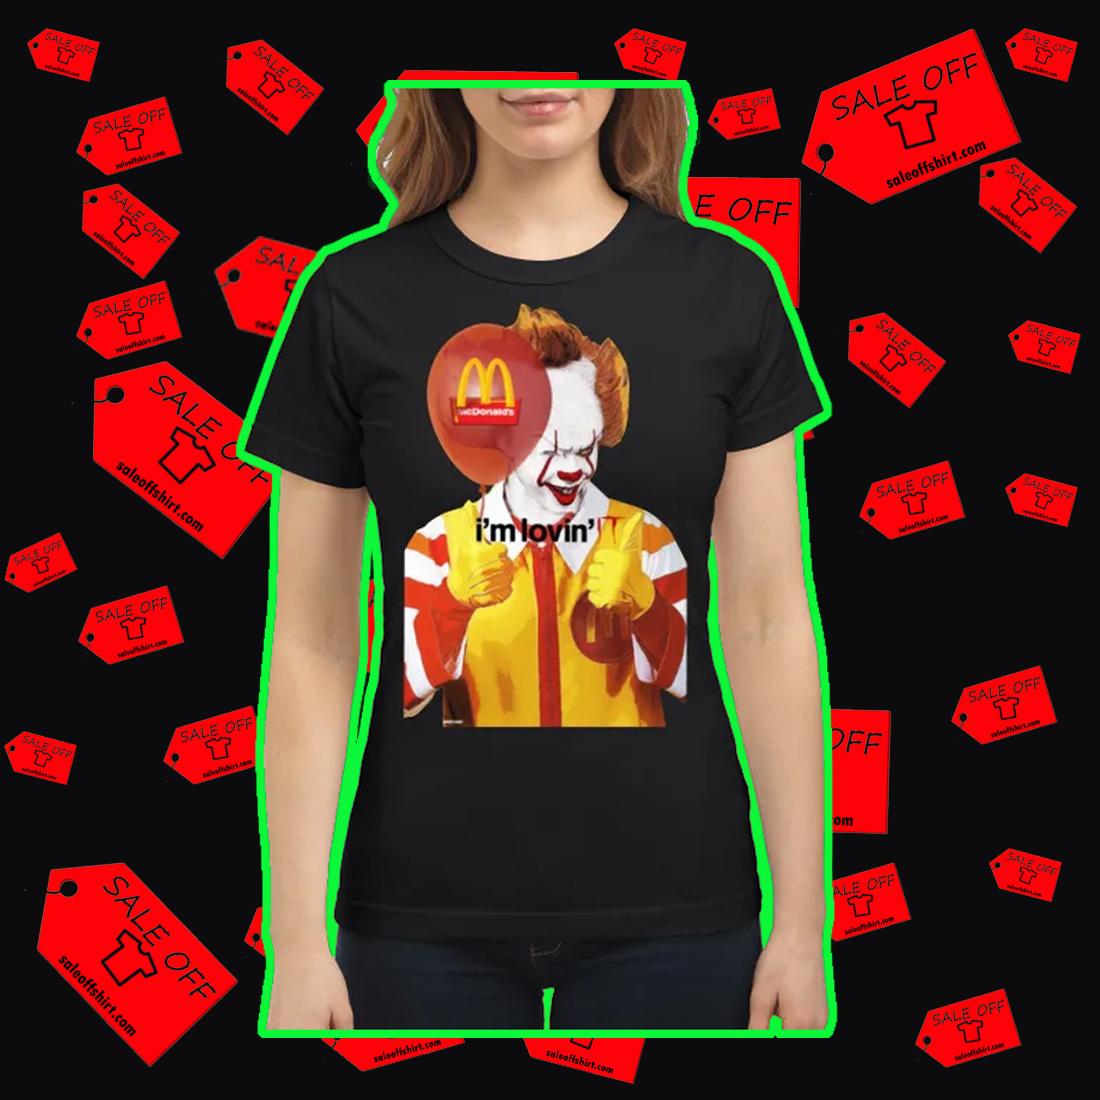 Mcdonald's I'm Lovin' IT shirt